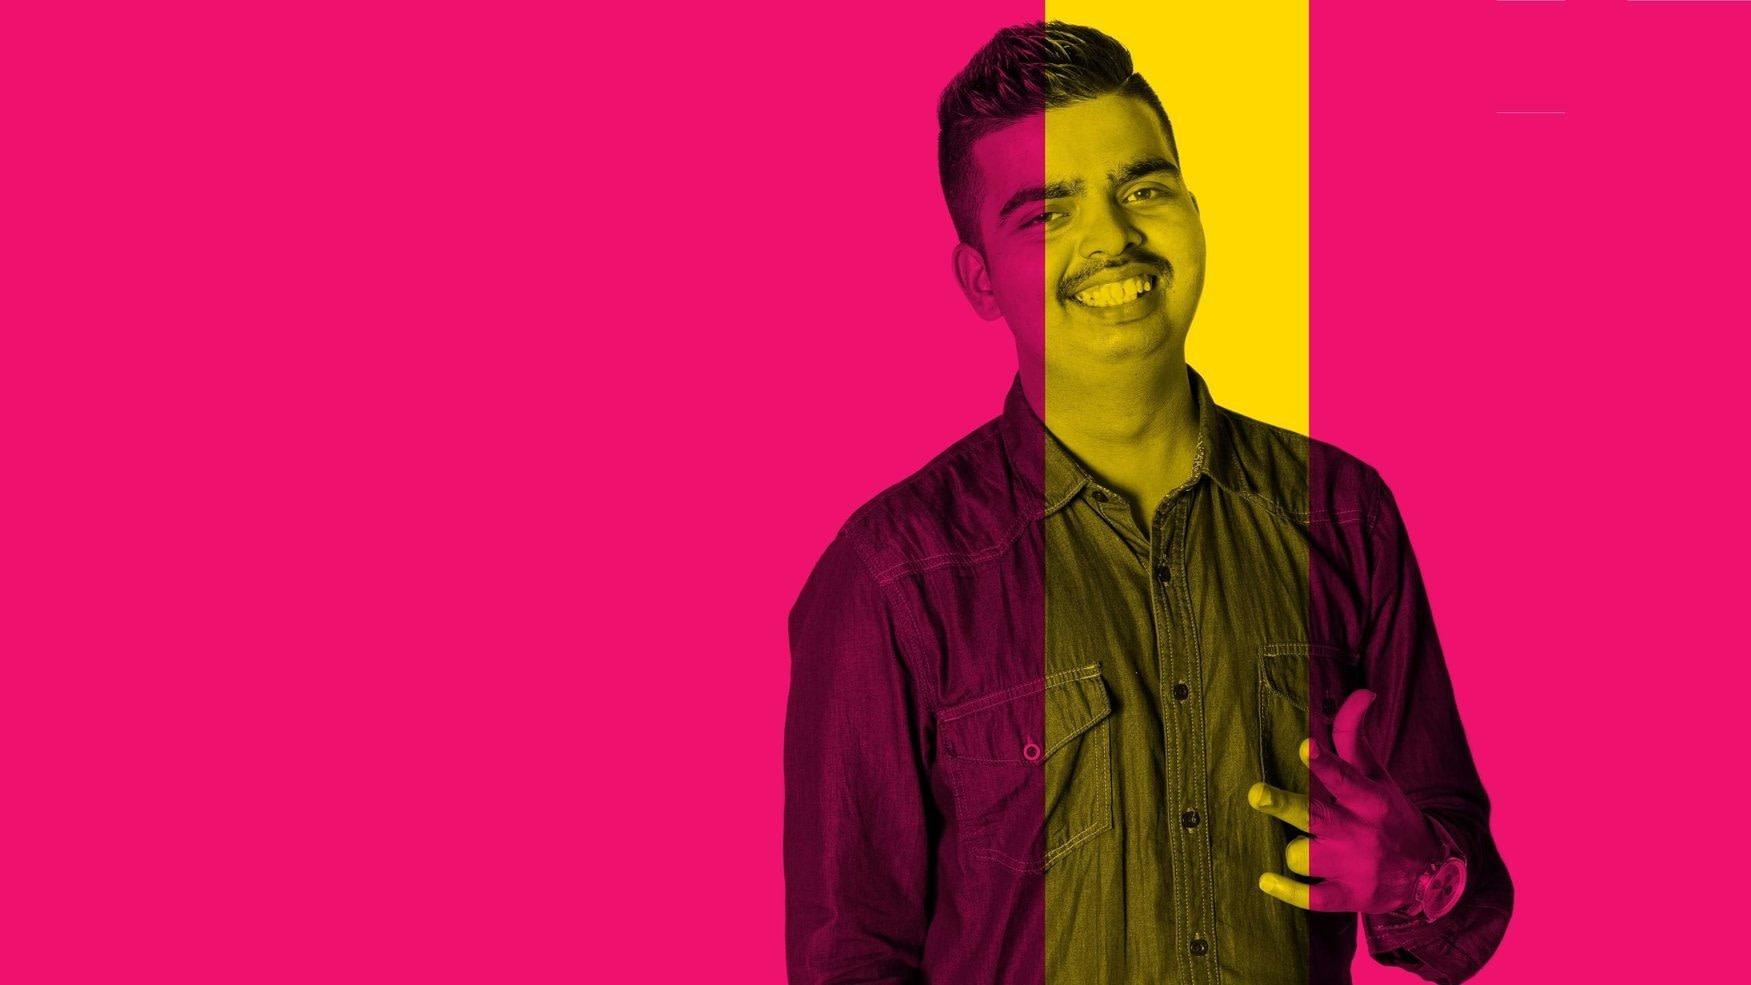 Dhruv Valera - Freelance Web Designer & Developer in New Zealand